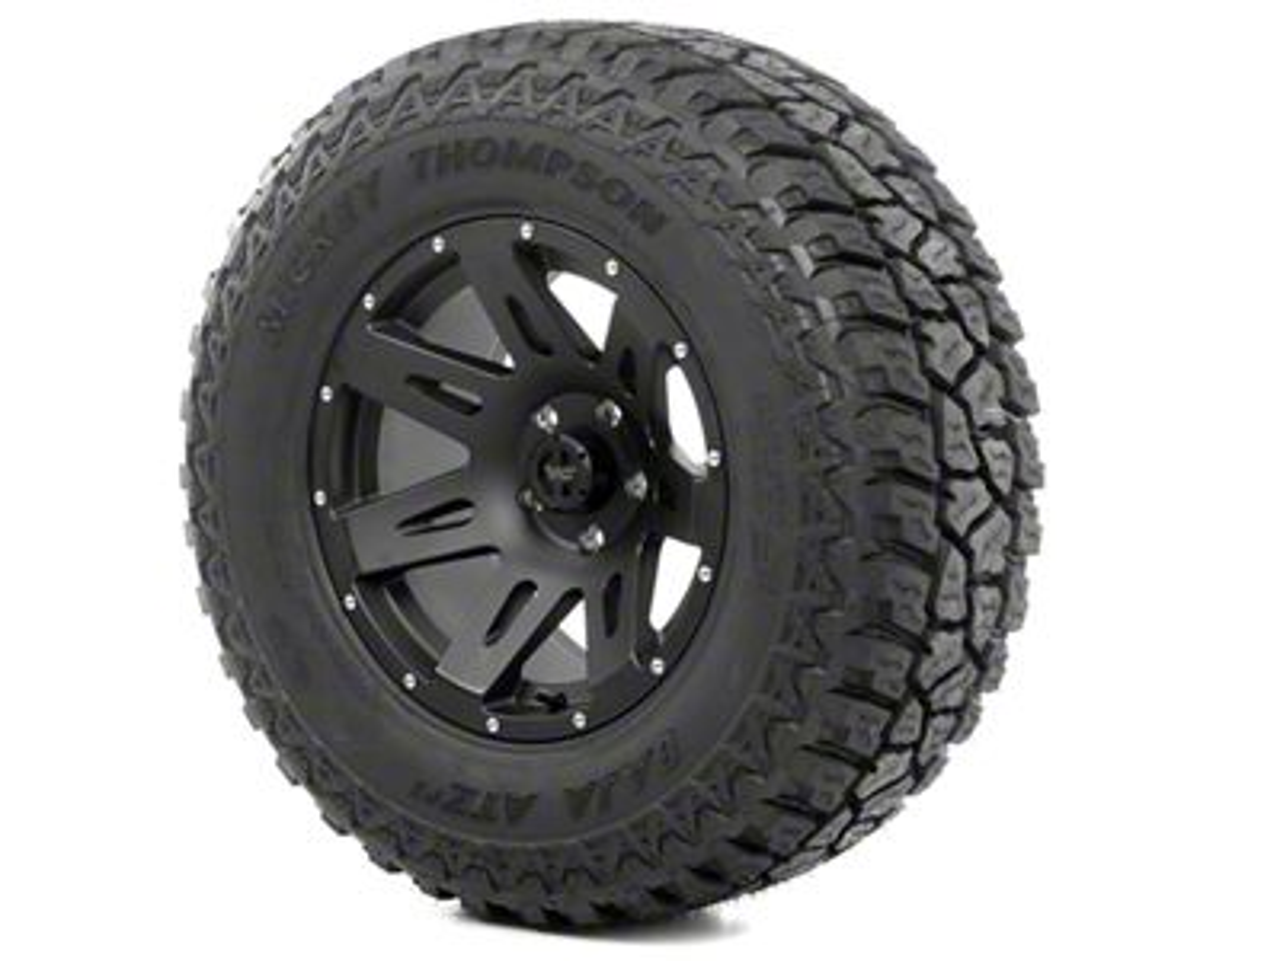 Rugged Ridge XHD Wheel 17x9 Black Satin and Mickey Thompson ATZ P3 315/70R17 Tire Kit (07-18 Jeep Wrangler JK)